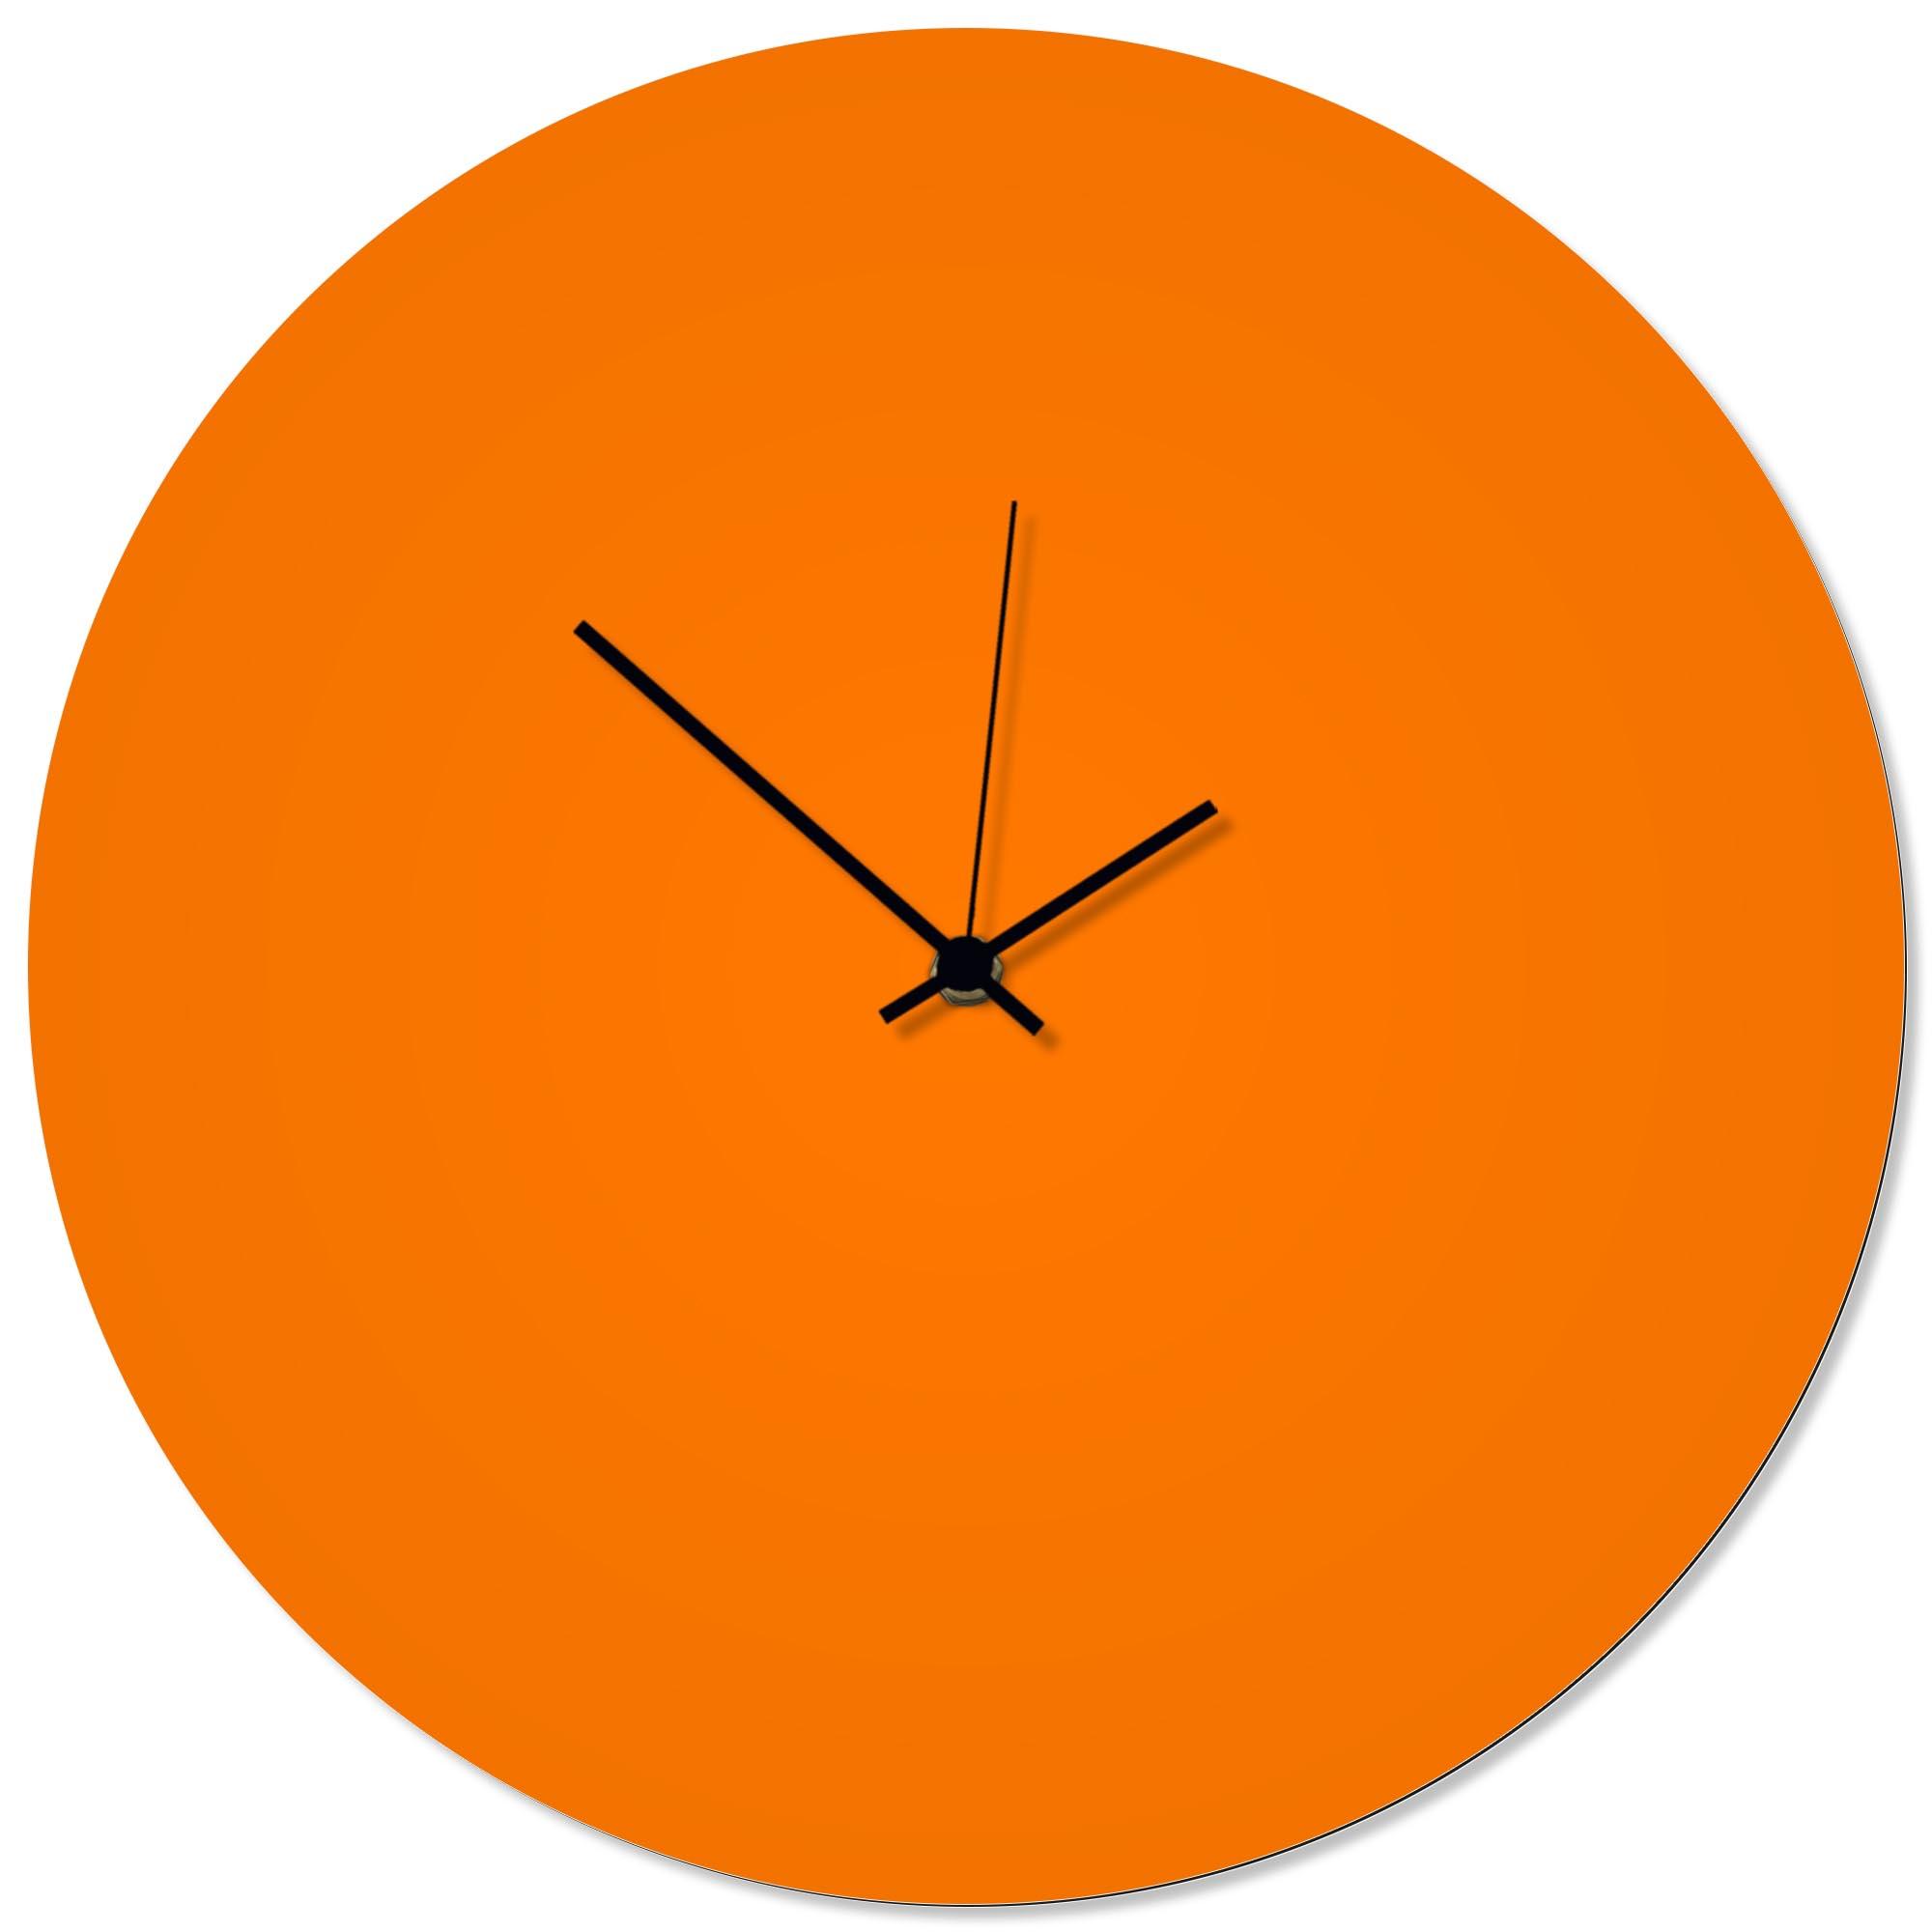 Orangeout Black Circle Clock 16x16in. Aluminum Polymetal